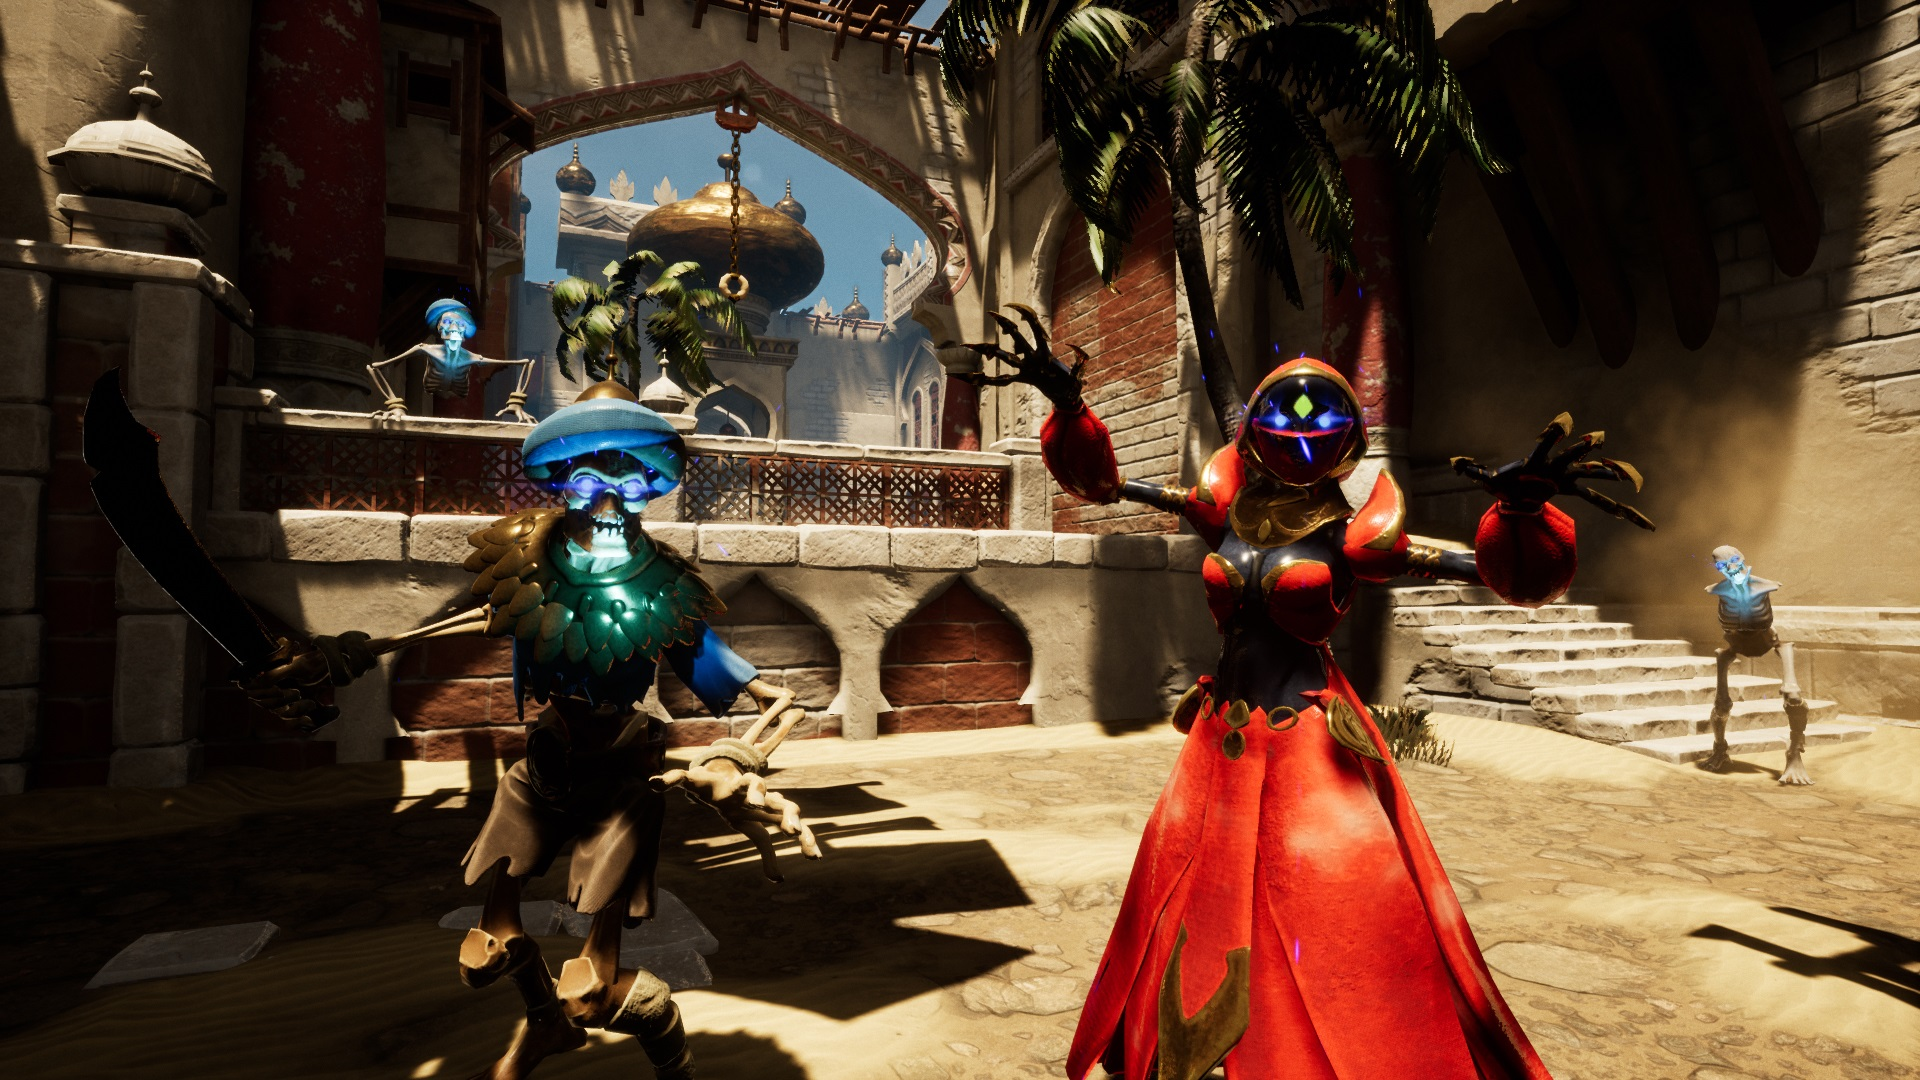 Former BioShock developers unveil City of Brass screenshot